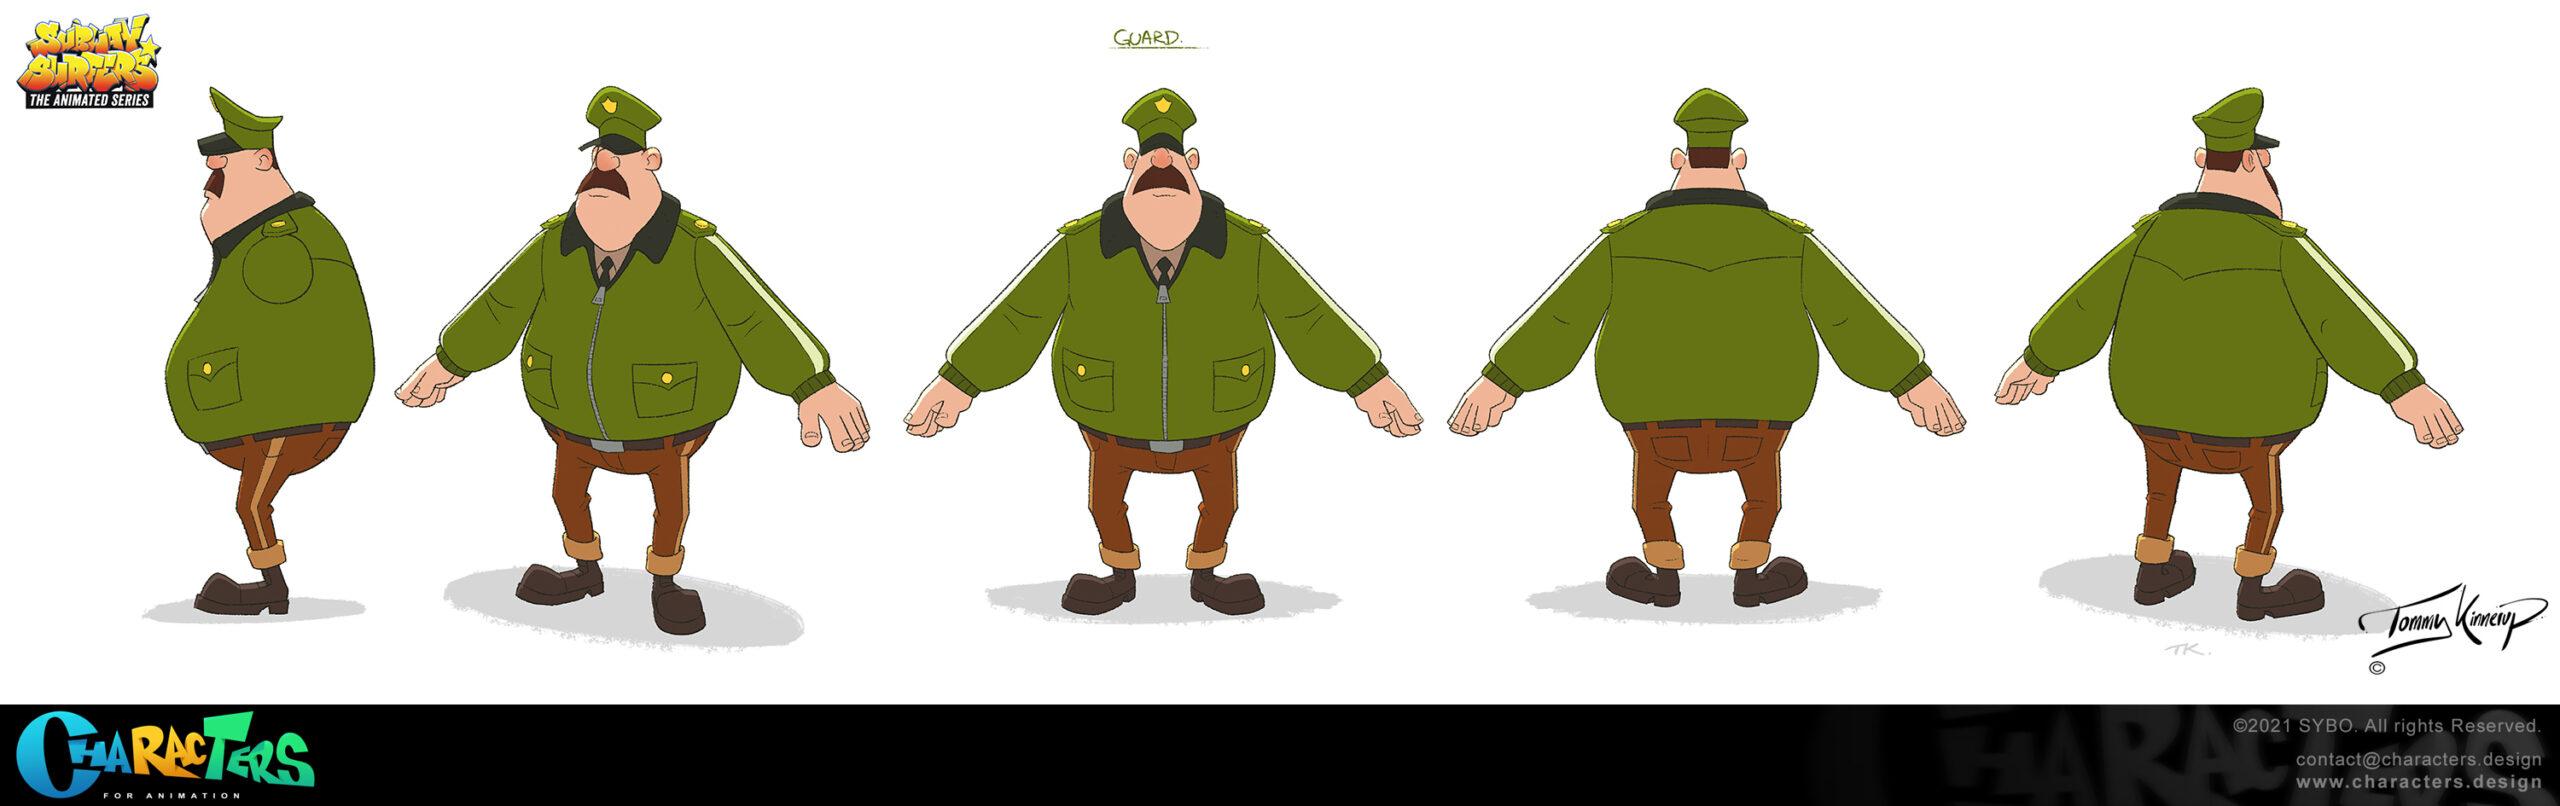 Characters_characterdesign_TK_v09